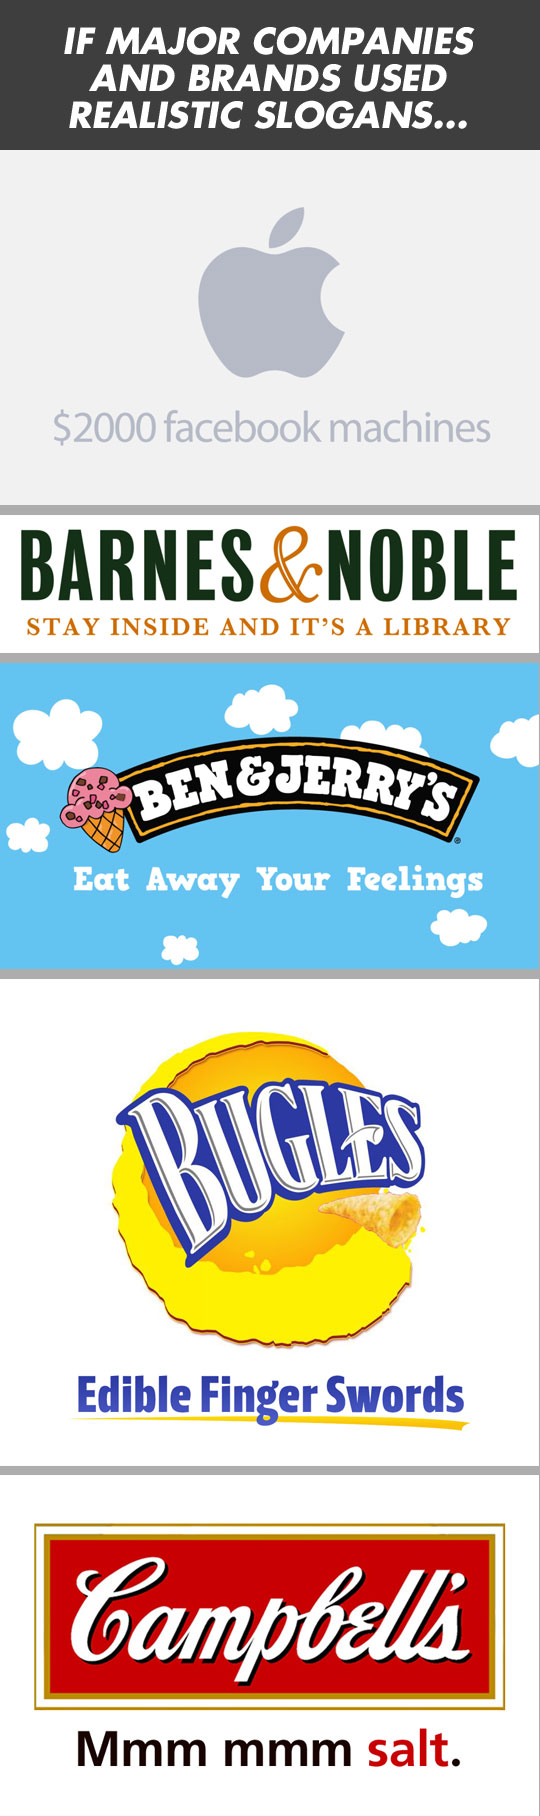 funny-brand-companies-realistic-slogan